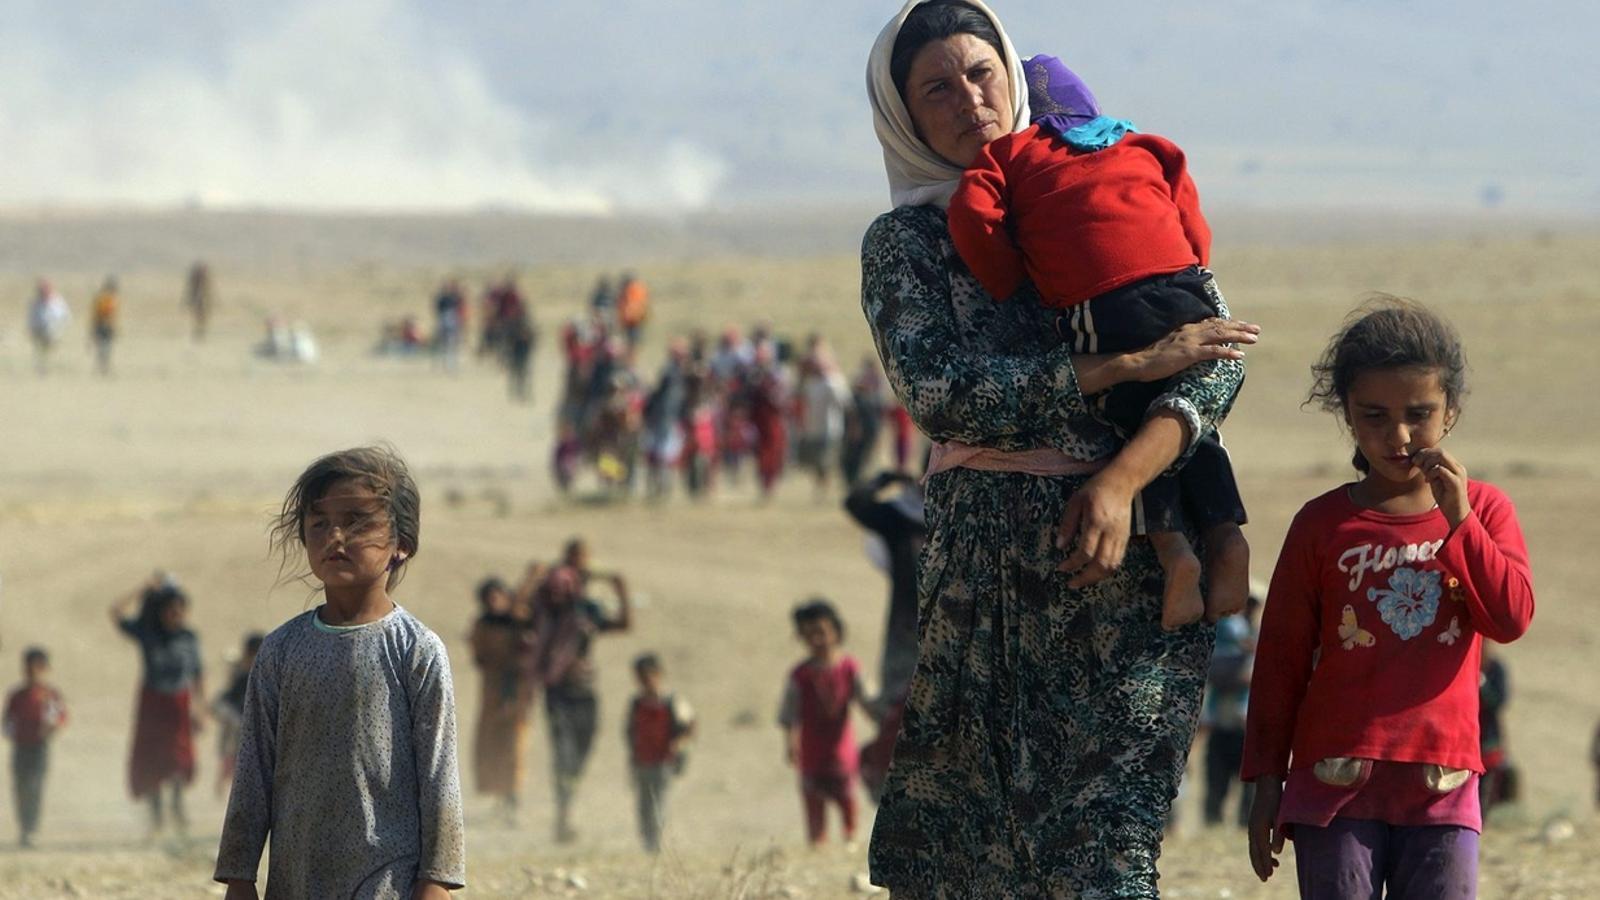 REFUGIADOS-UE II - Página 2 Refugiats-Programa-WFP-Siria-del_1259284079_7121821_651x366